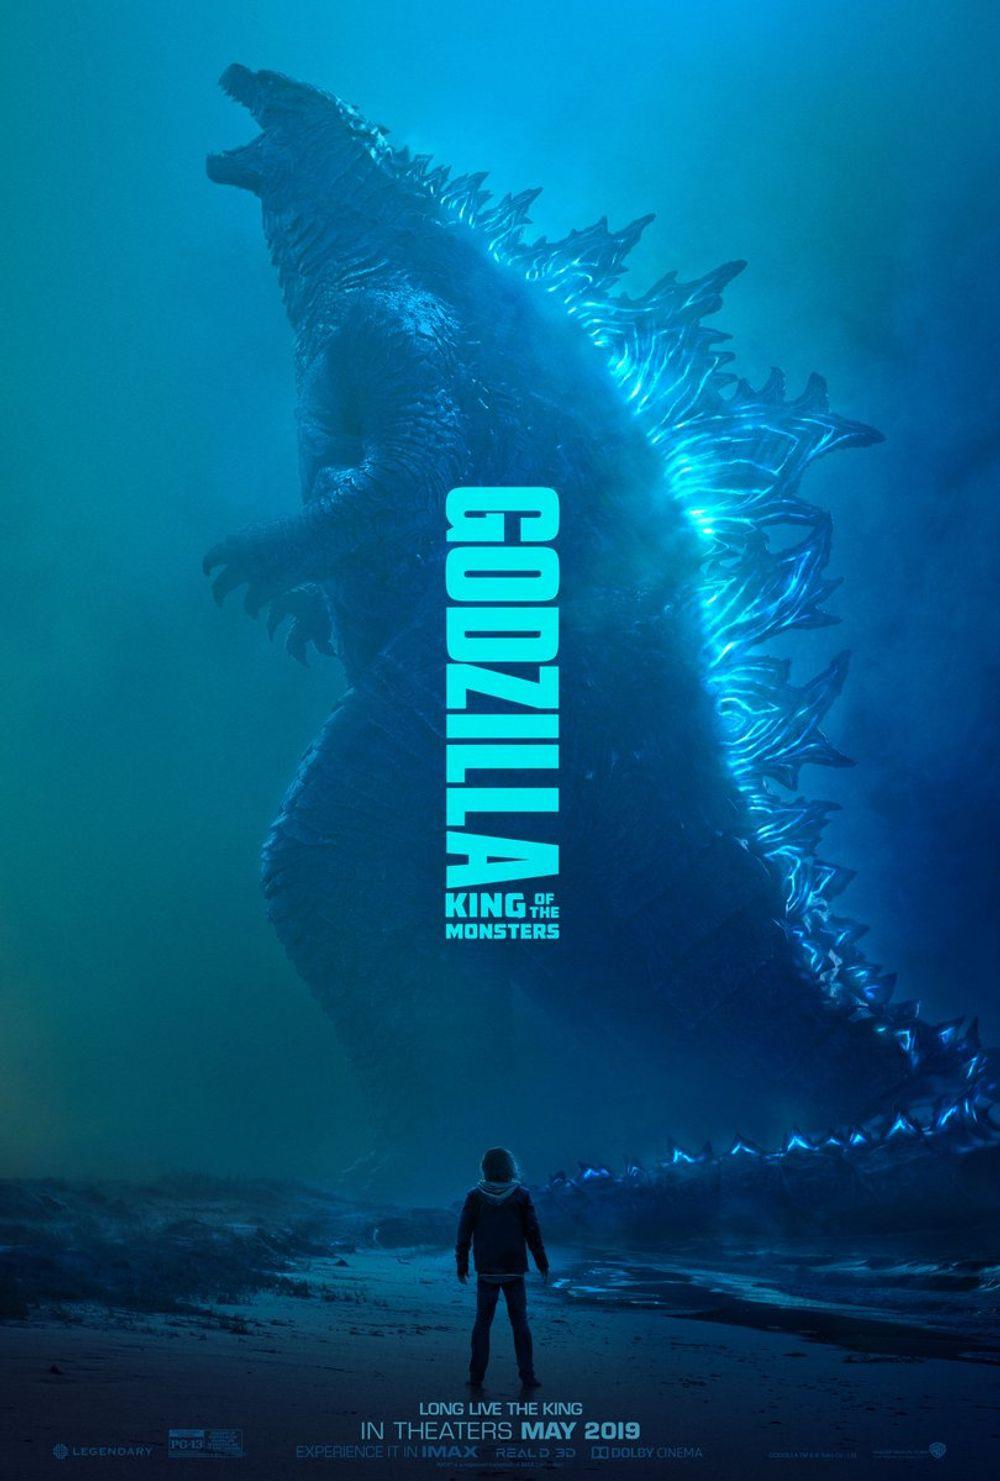 Godzilla King of the Monsters (2019) Hindi Dubbed Movie HDRip 720p AAC